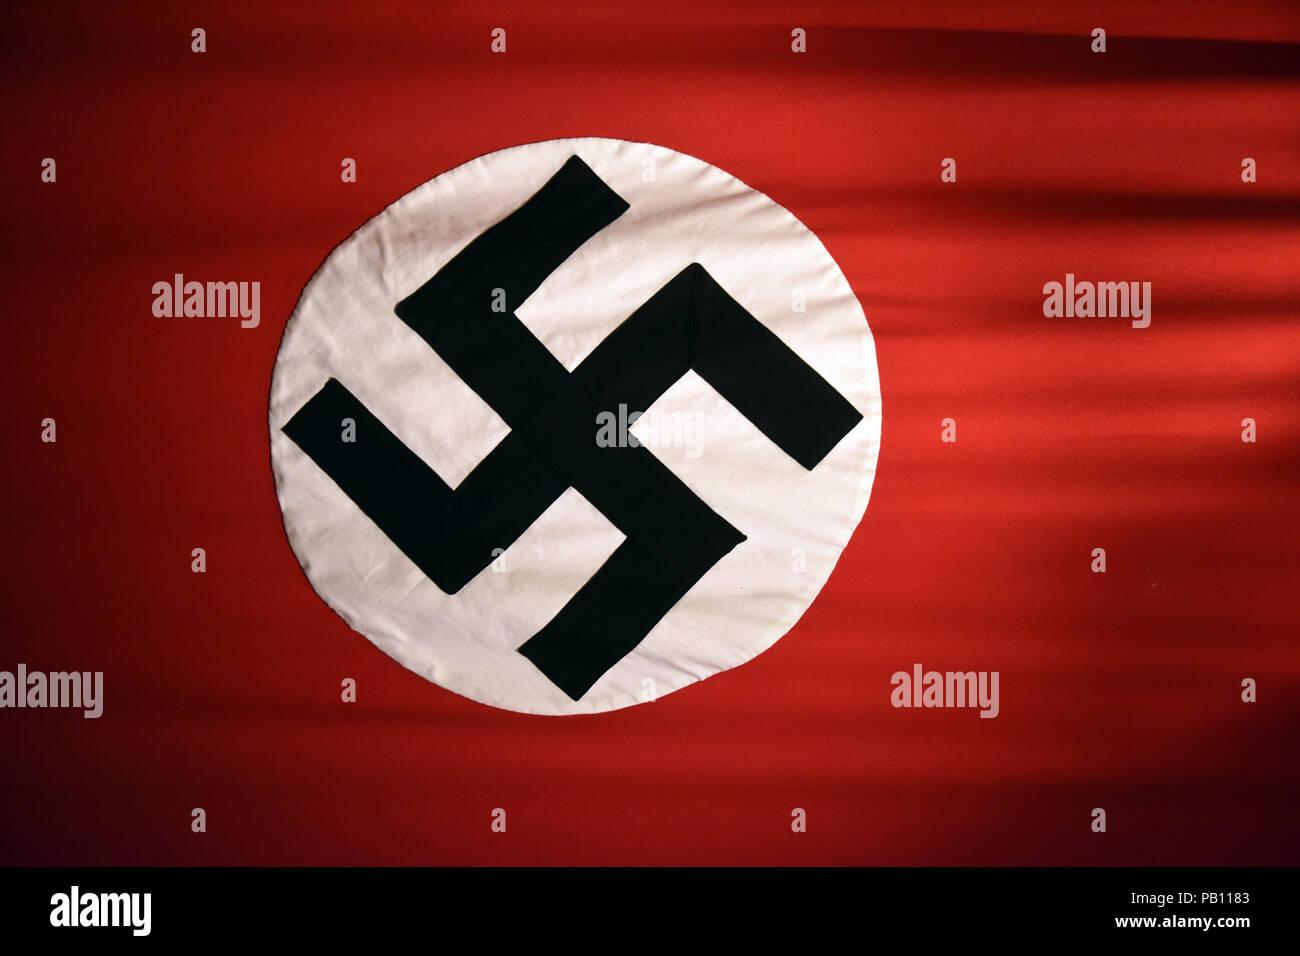 German Third Reich nazi flag with swastika - Stock Image